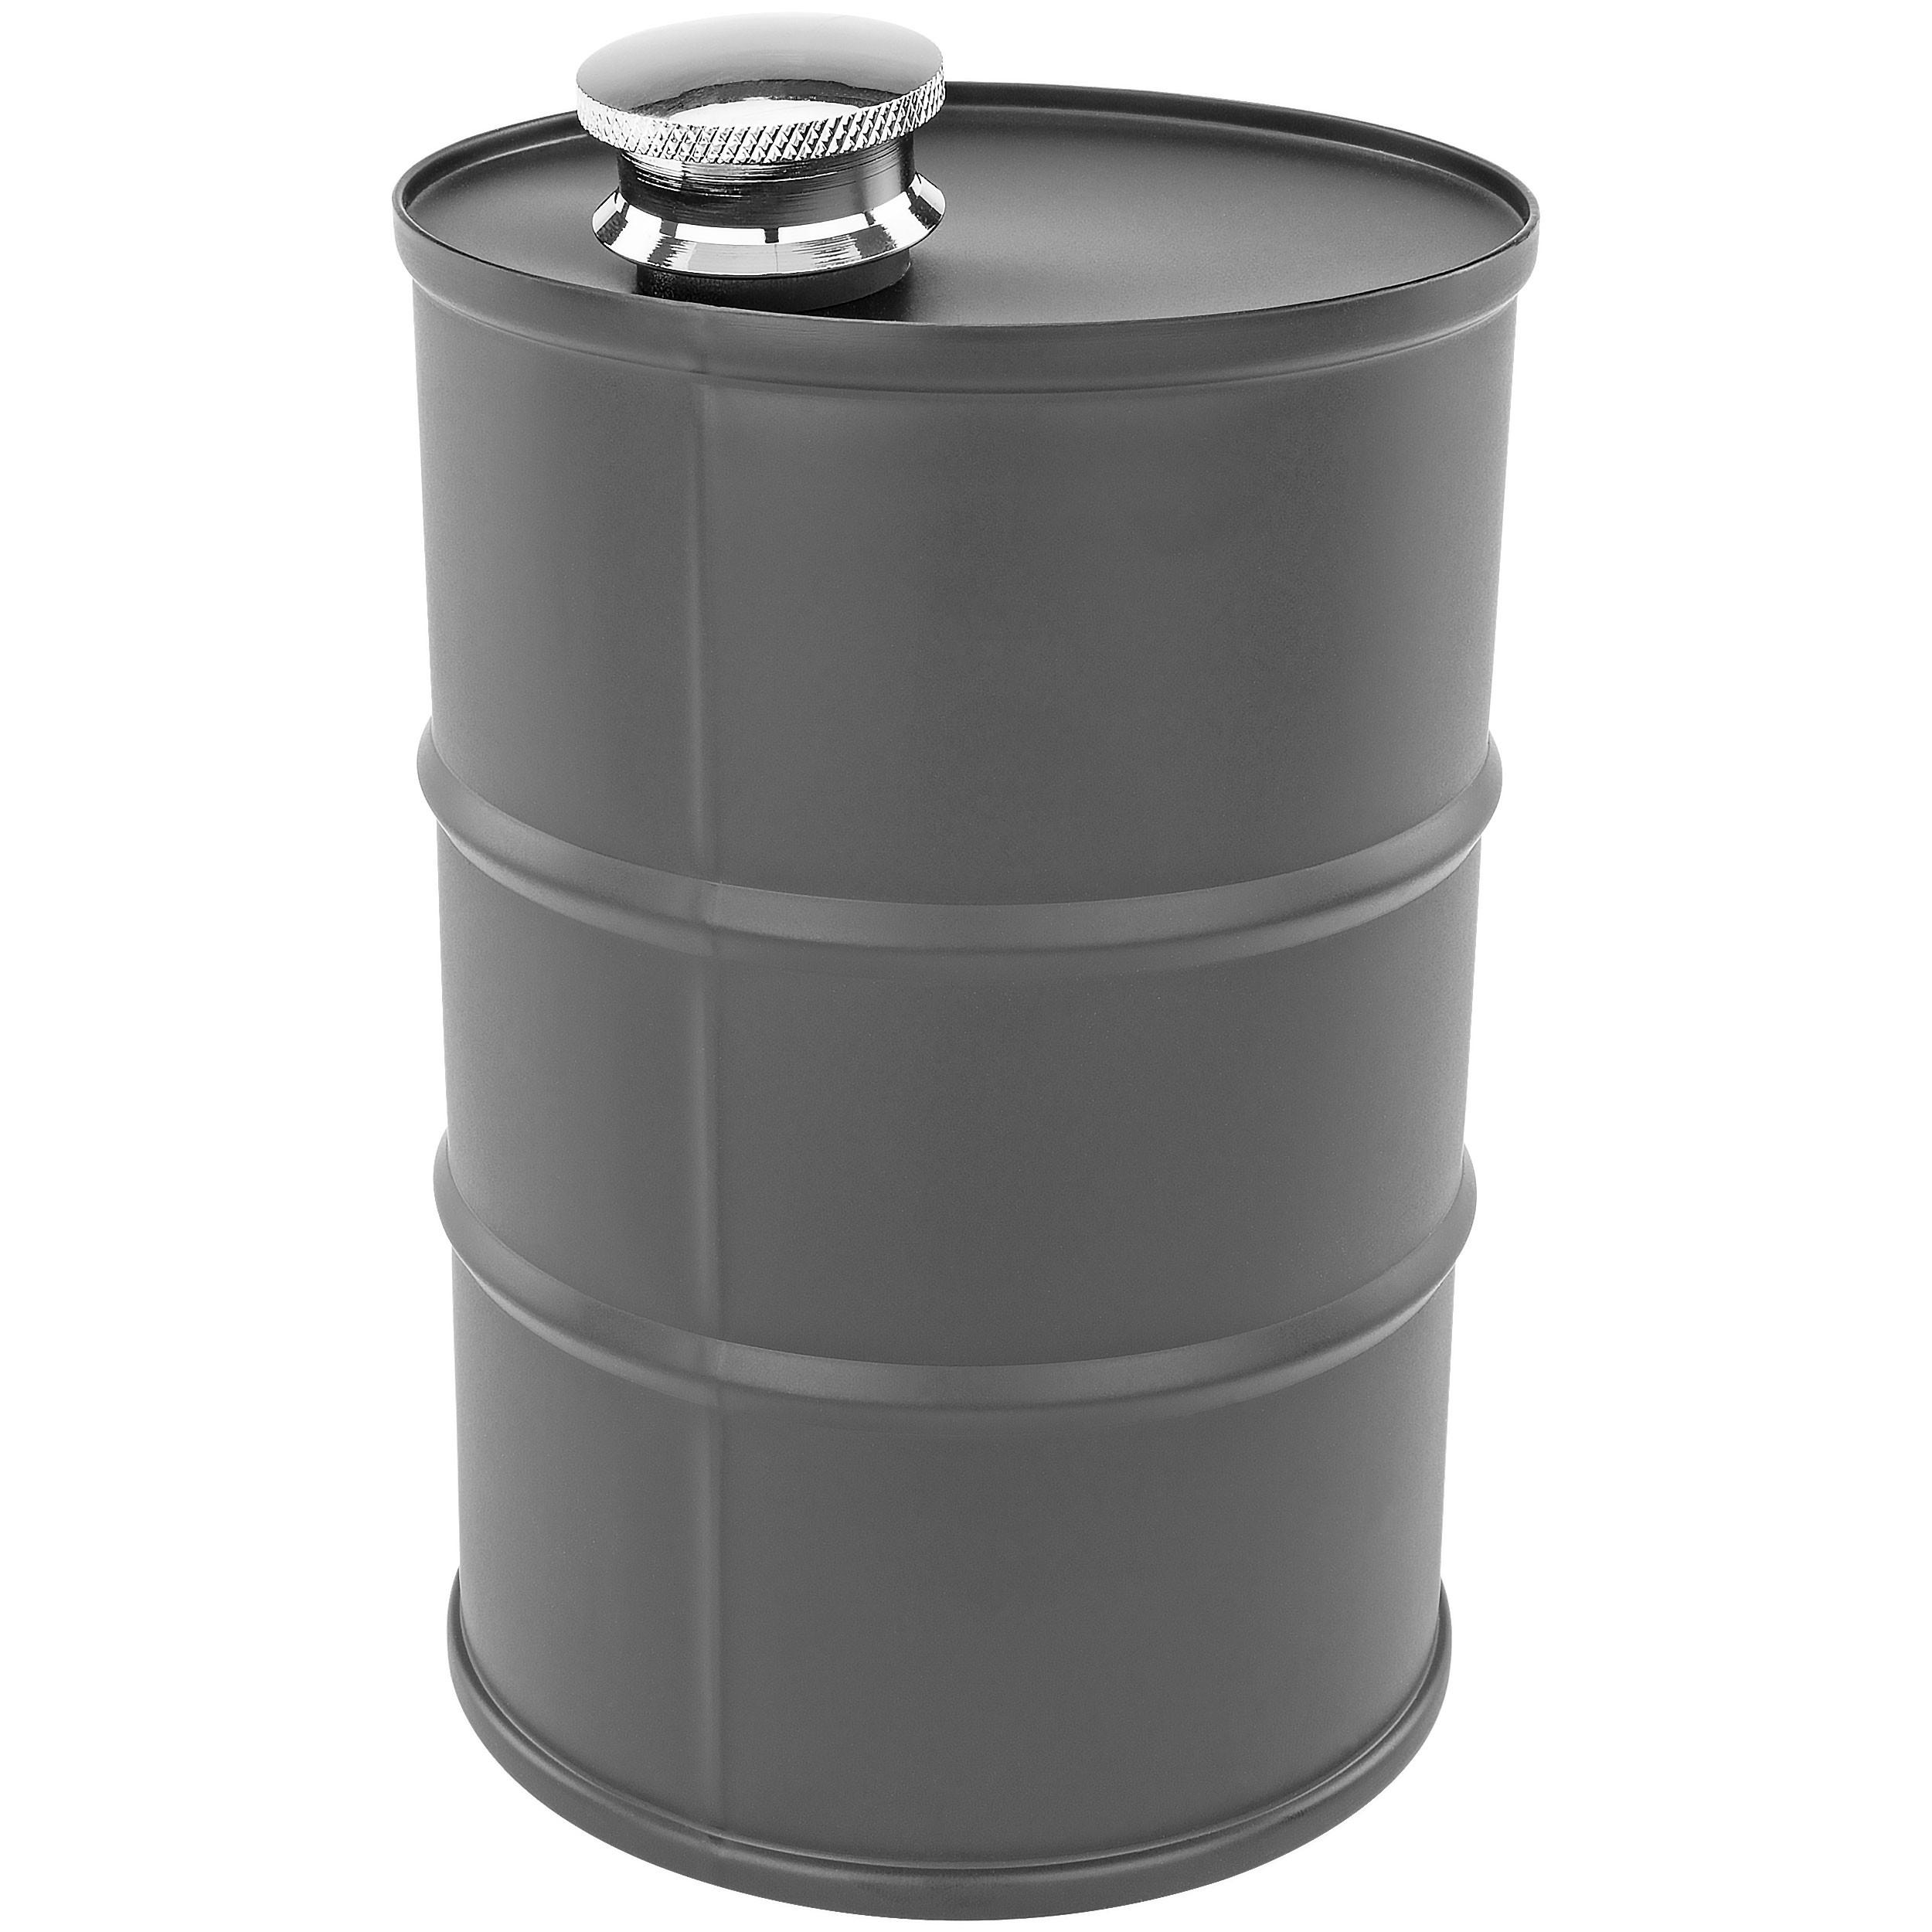 Fairly Odd Novelties FON-10228 Novelty Oil Barrel Flask, 26-ounce, One Size, Black